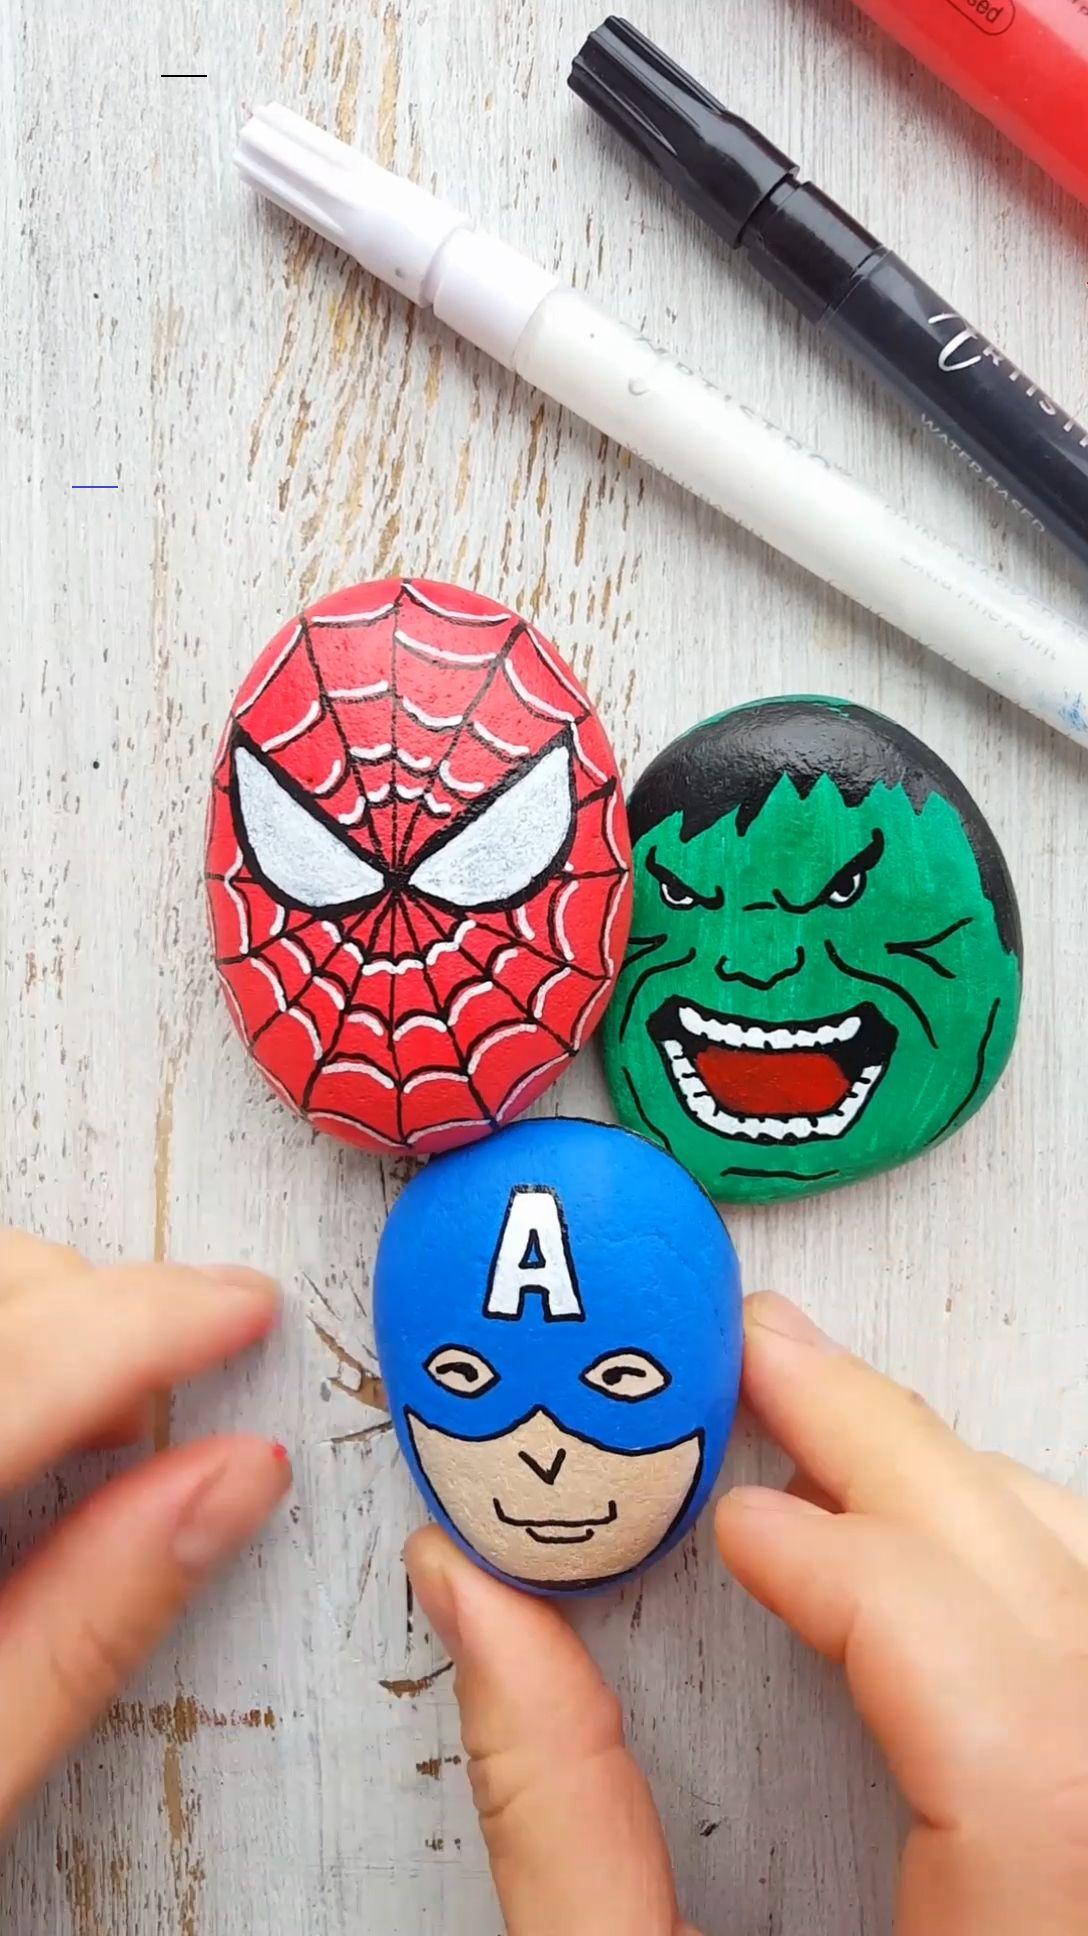 Make Your Own Superhero